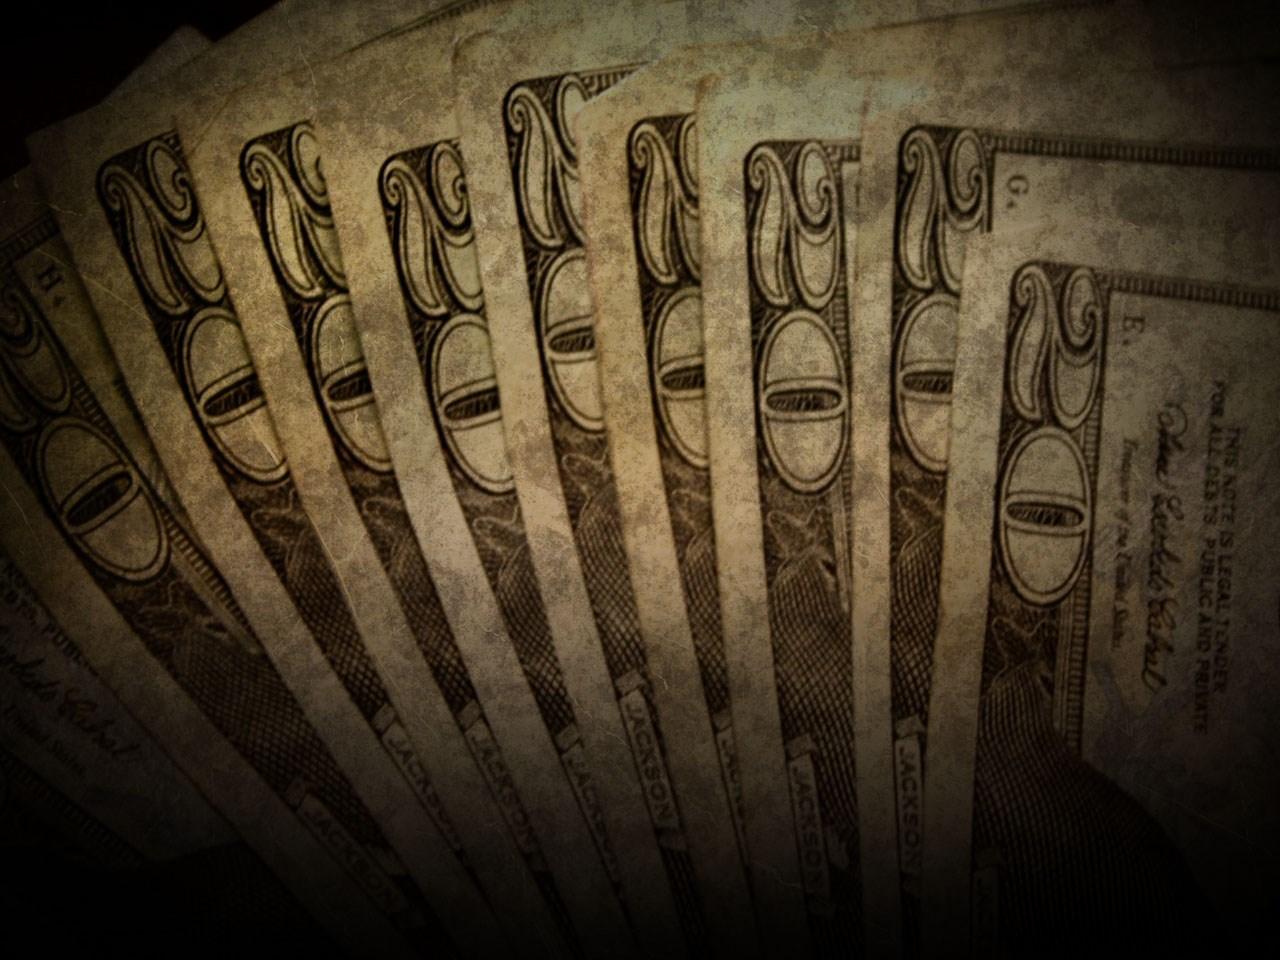 Money-MGN Online_1527450819891.jpeg.jpg